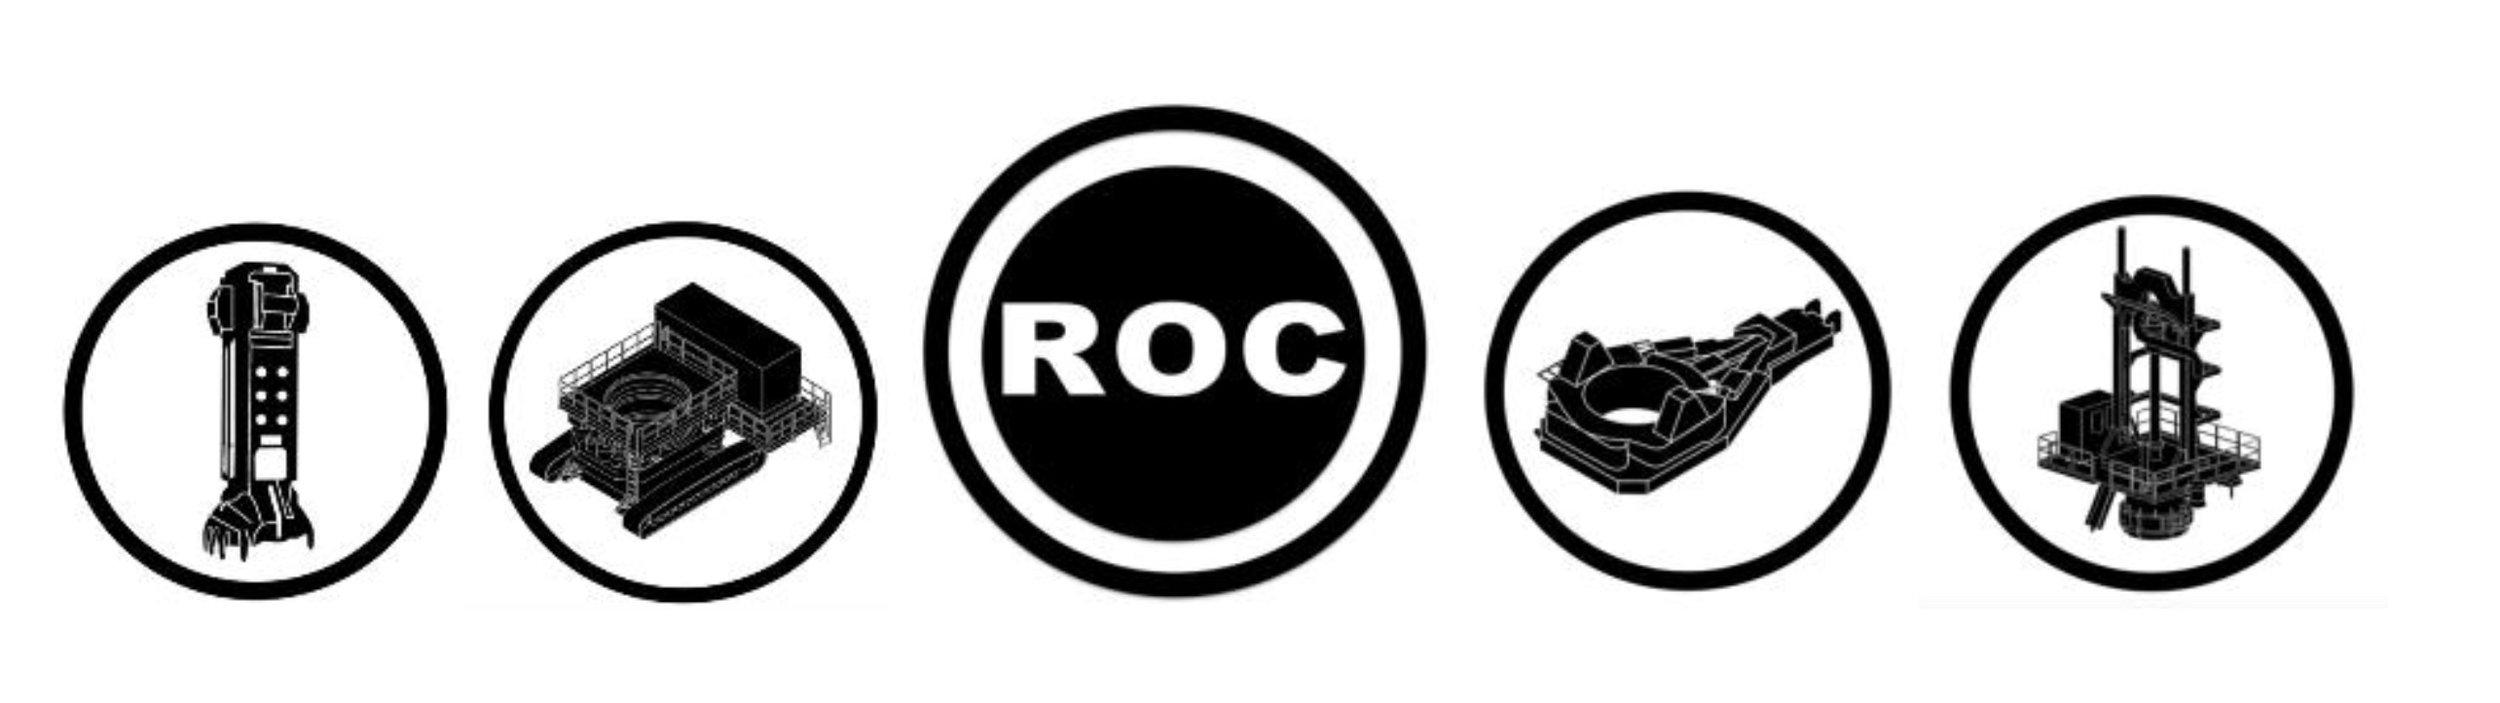 ROC Circle Icons.jpg